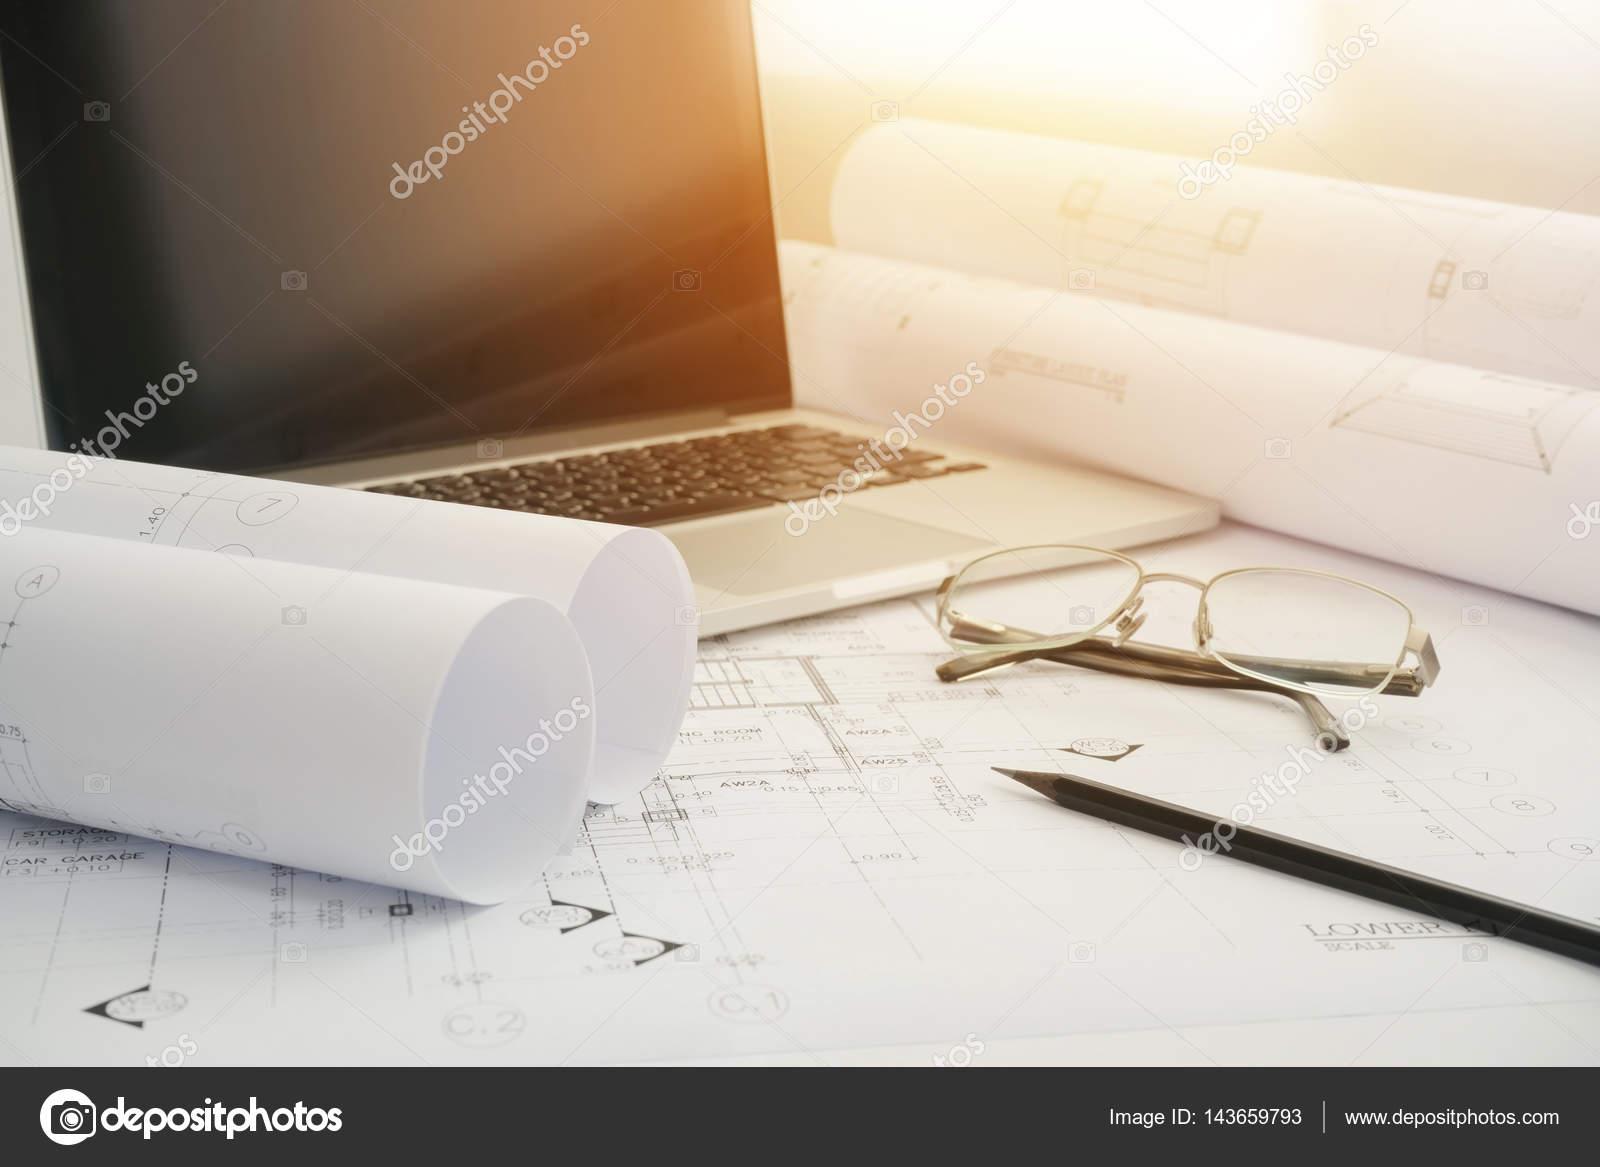 Negro lpiz y computadora porttil de papel de dibujo arquitectnico negro lpiz y computadora porttil de papel de dibujo arquitectnico para la construccin foto de malvernweather Image collections